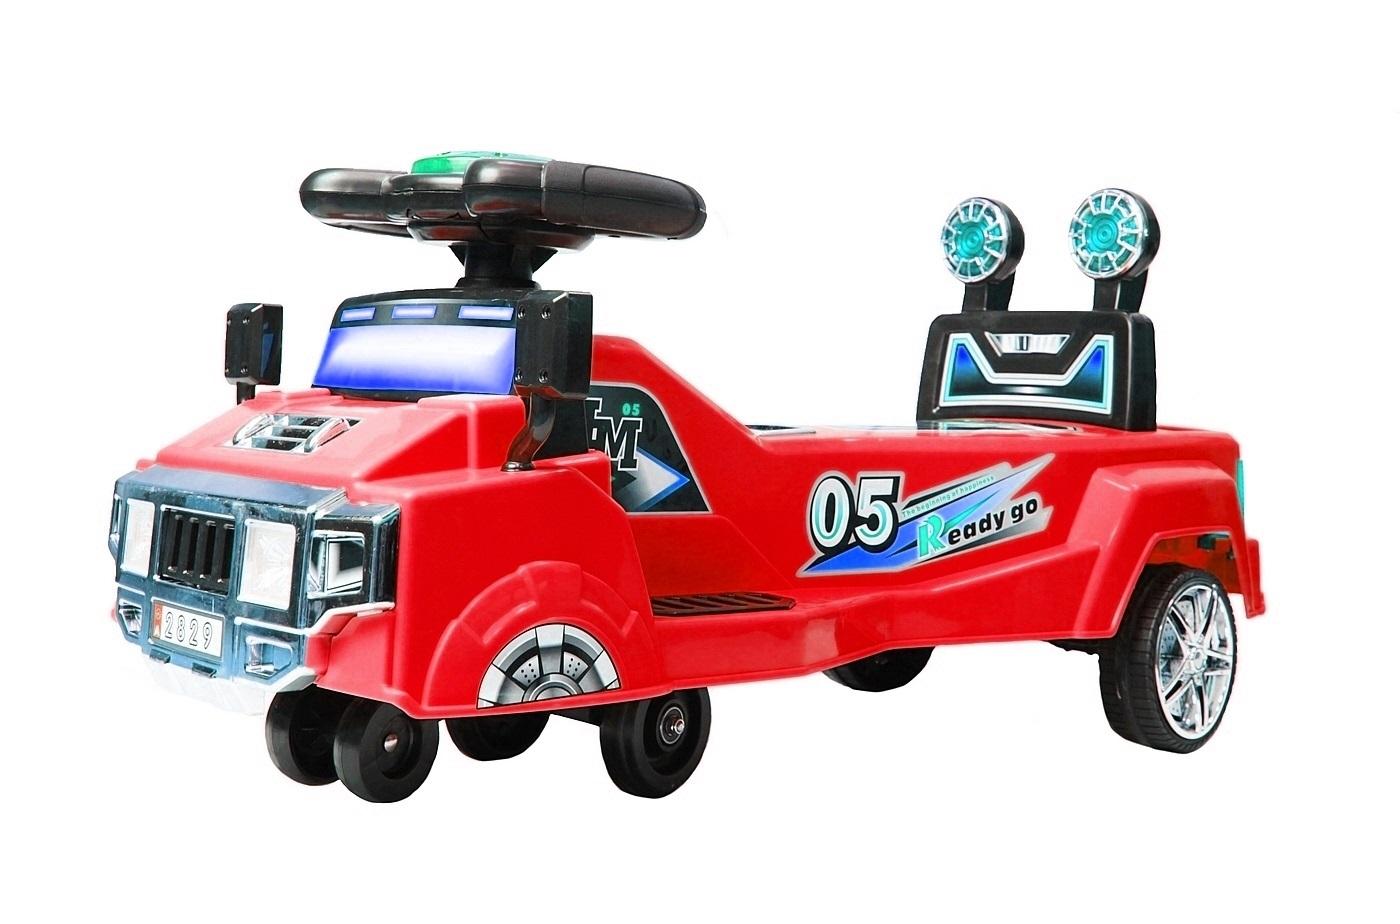 Купить Машинка-каталка Twister red Y-Scoo, 3701RT